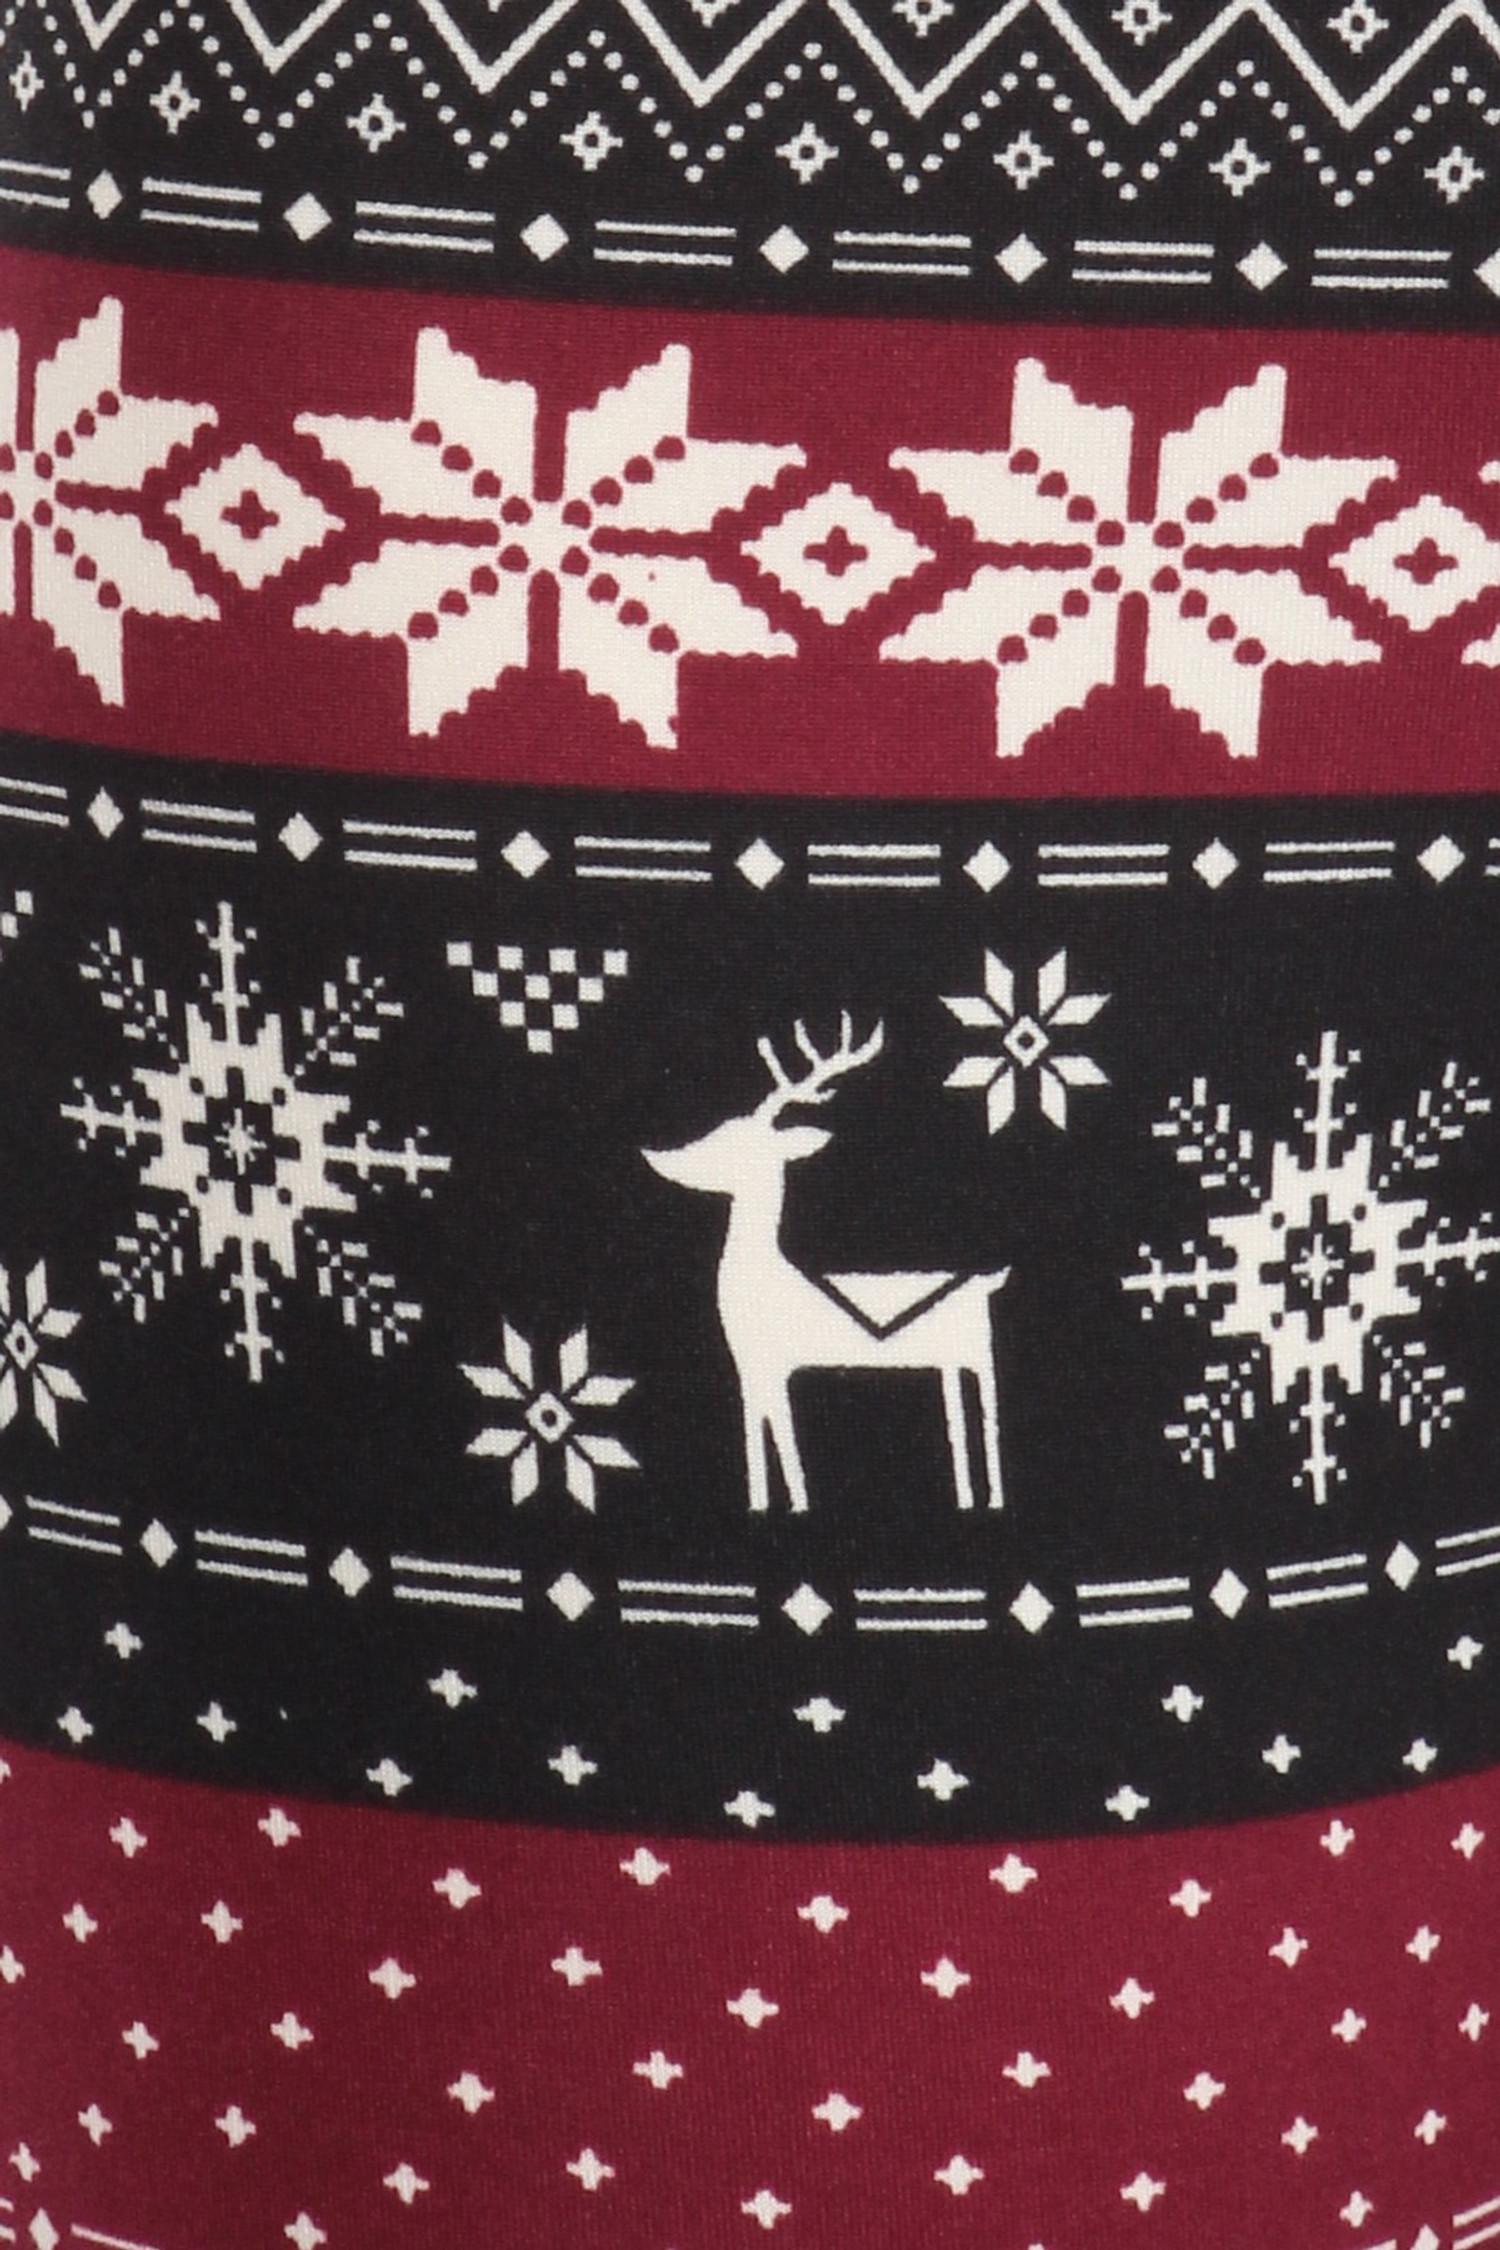 Soft Fleece Beautiful Burgundy Reindeer and Snowflake Leggings